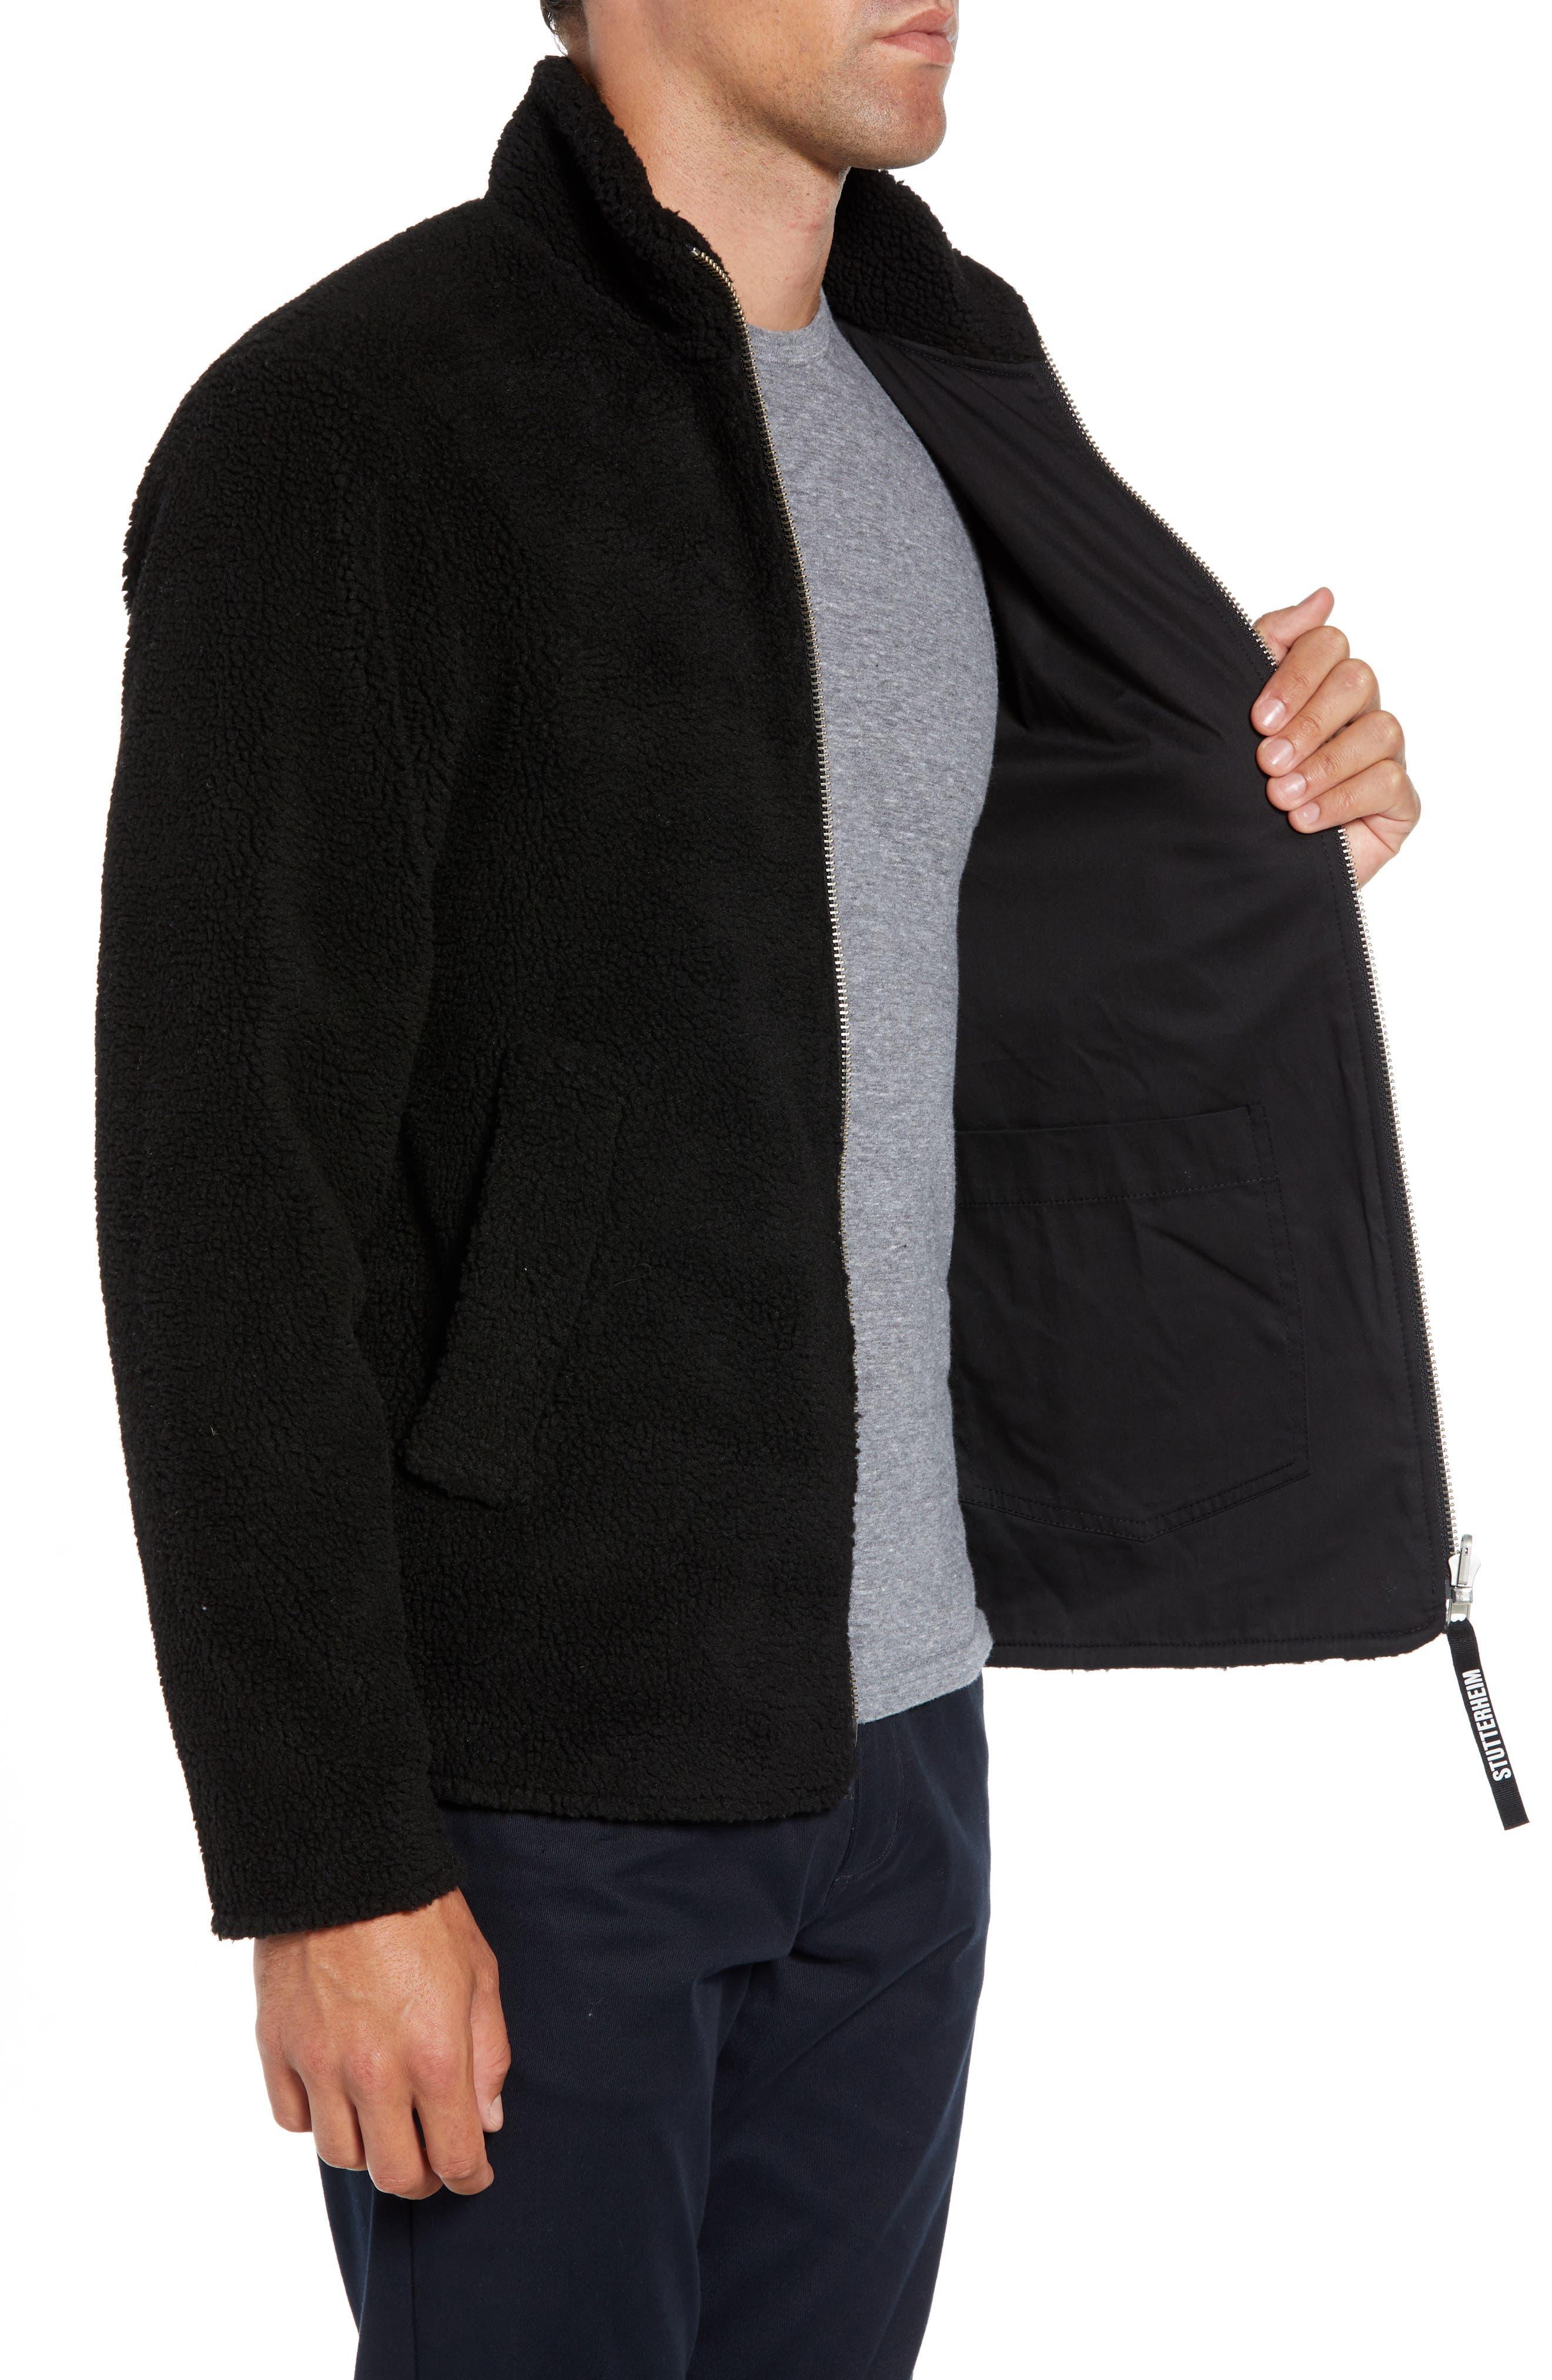 Varby Reversible Fleece Jacket,                             Alternate thumbnail 4, color,                             BLACK